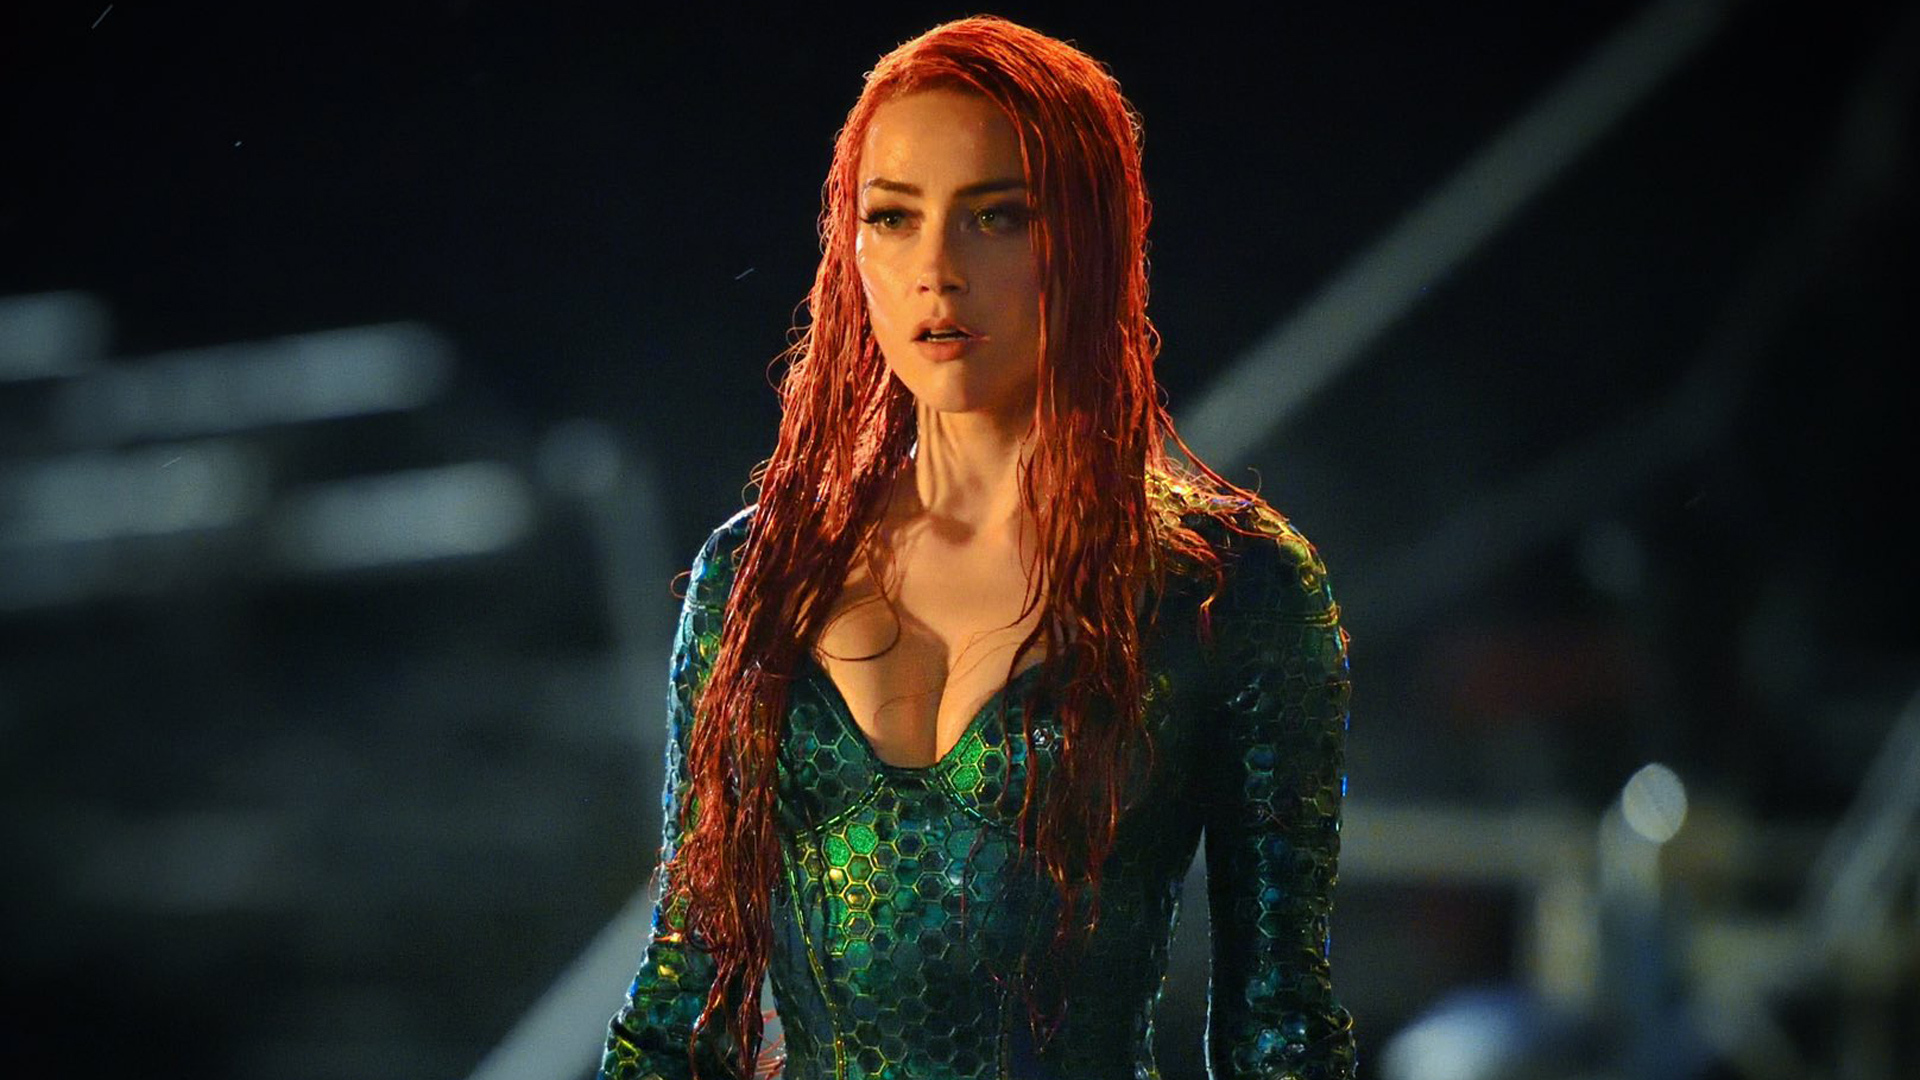 1920X1080 Amber Heard As Mera In Aquaman Laptop Full Hd 1080P Hd 4K Wallpapers, Images -8406